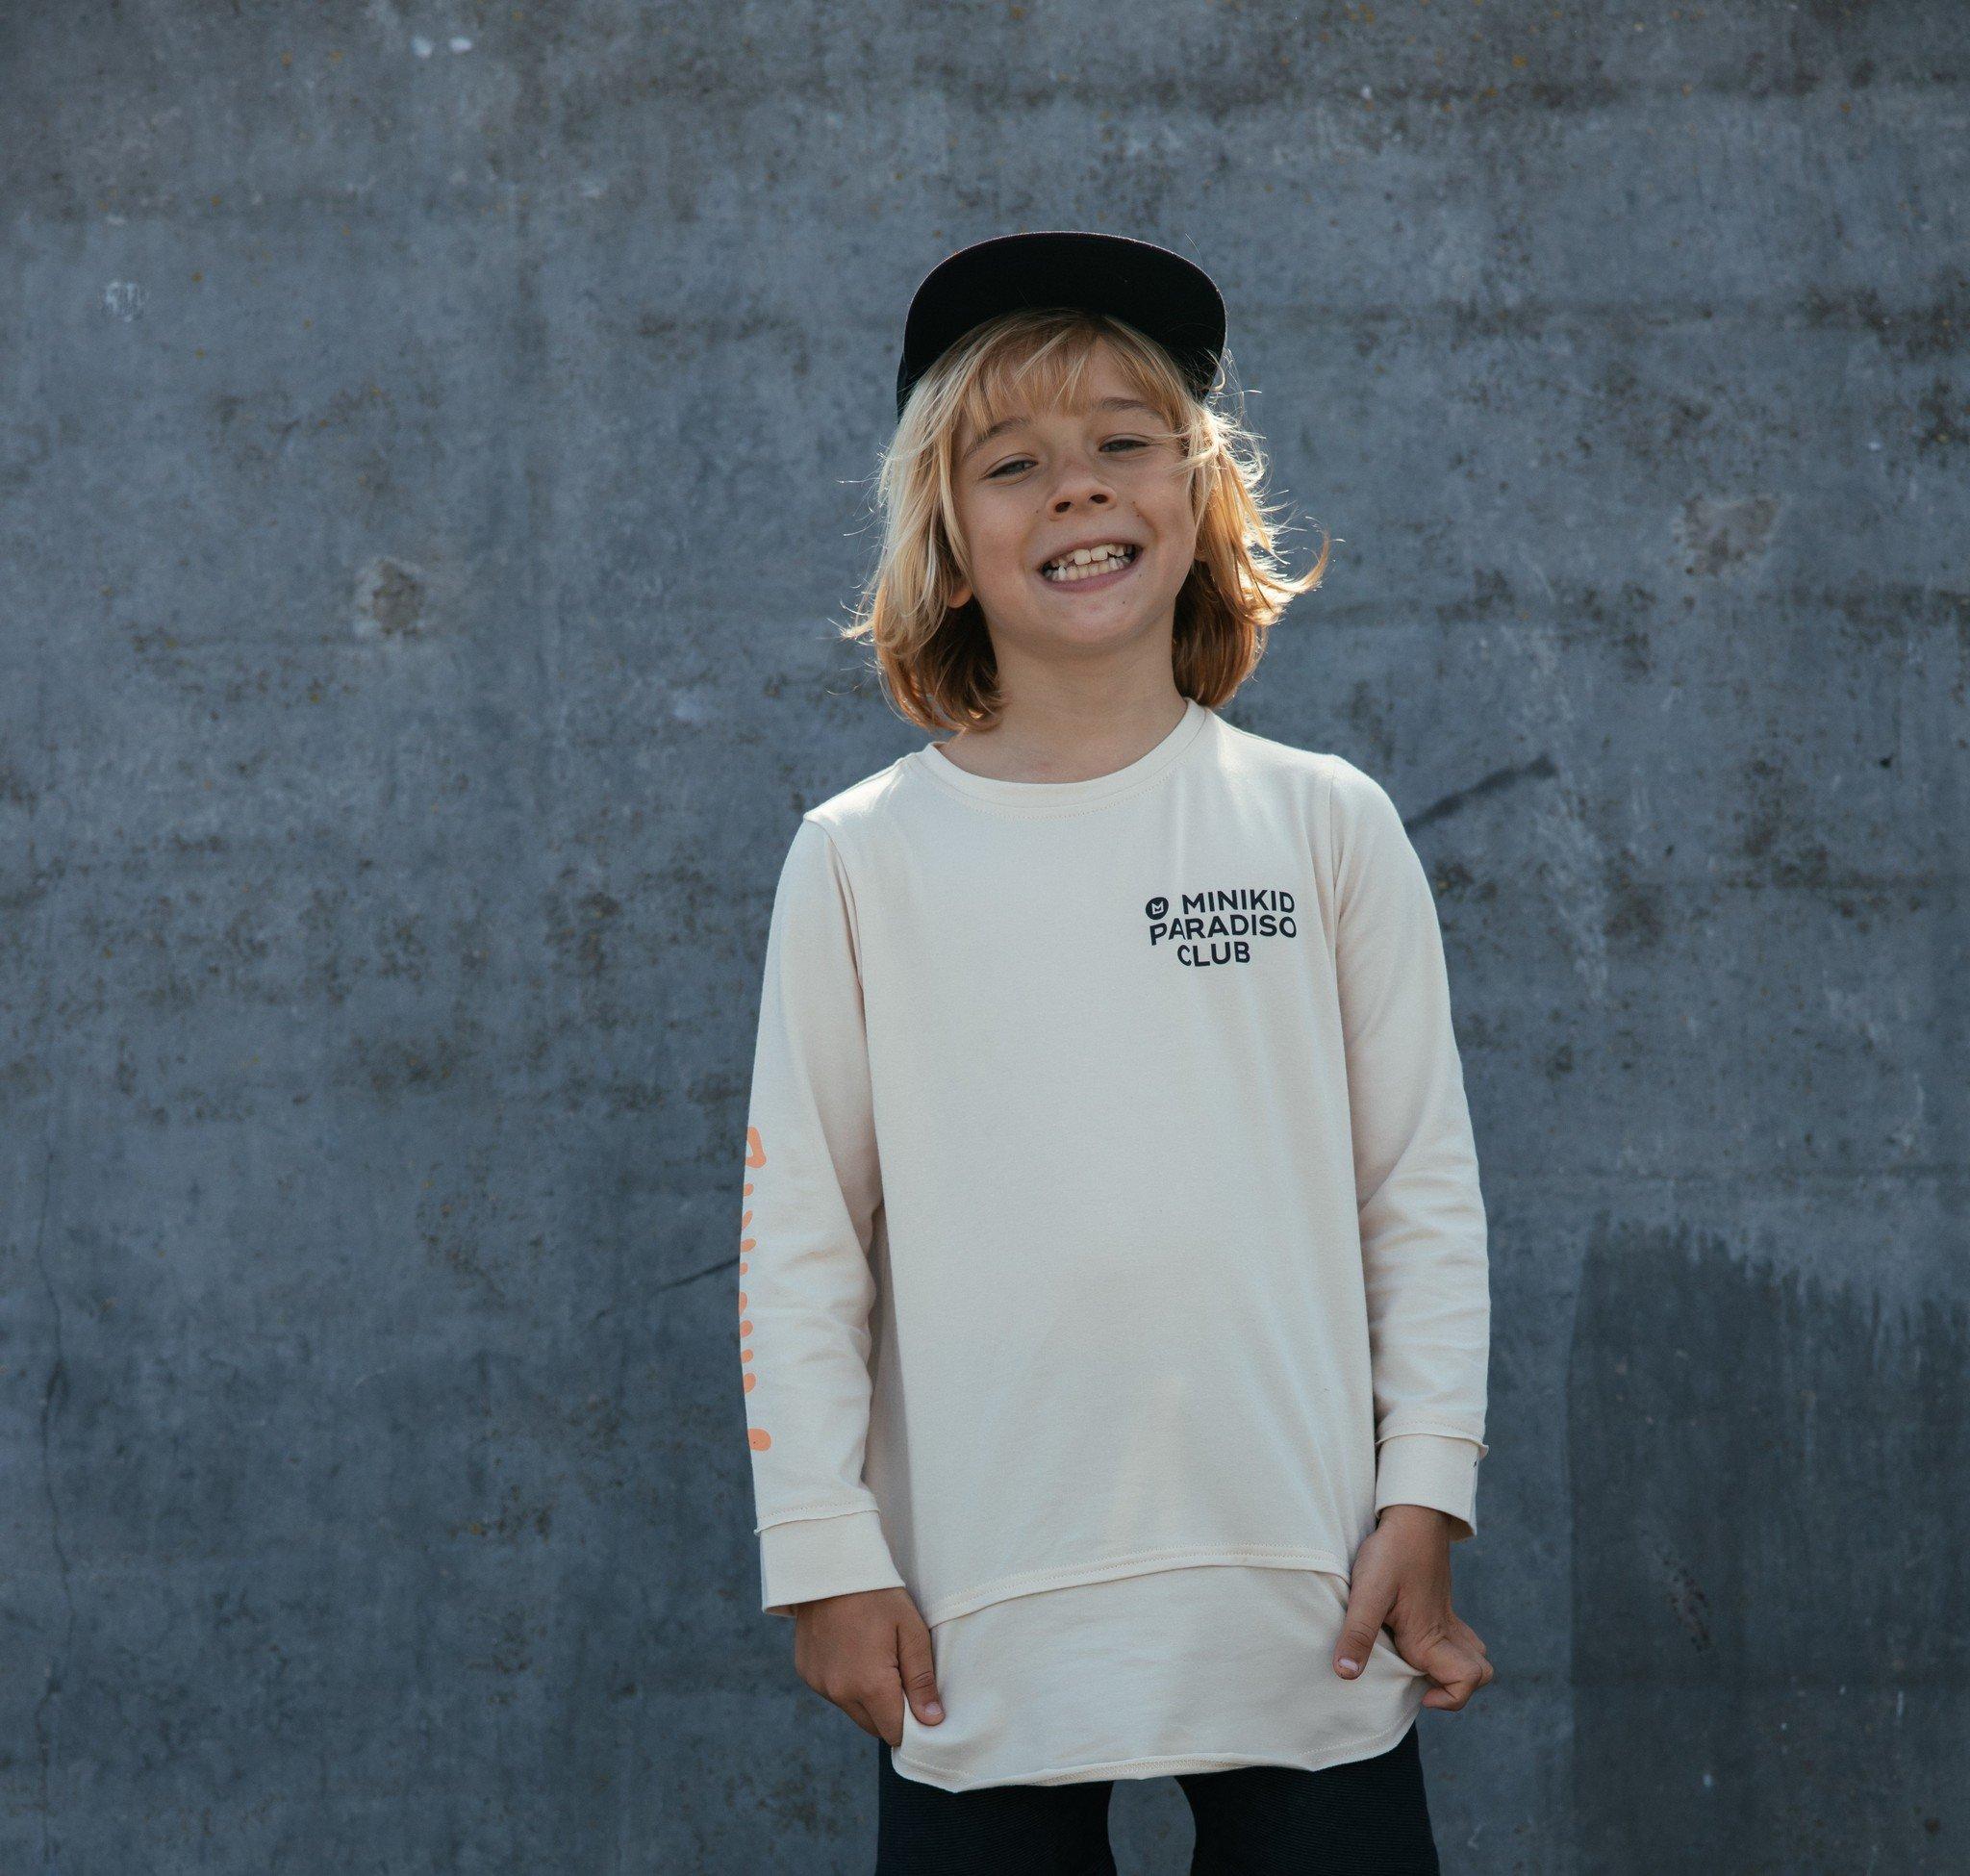 Minikid COLORFUL COOL SHIRT | LONGER LONG SLEEVE | MINIKID CHILDREN'S CLOTHES